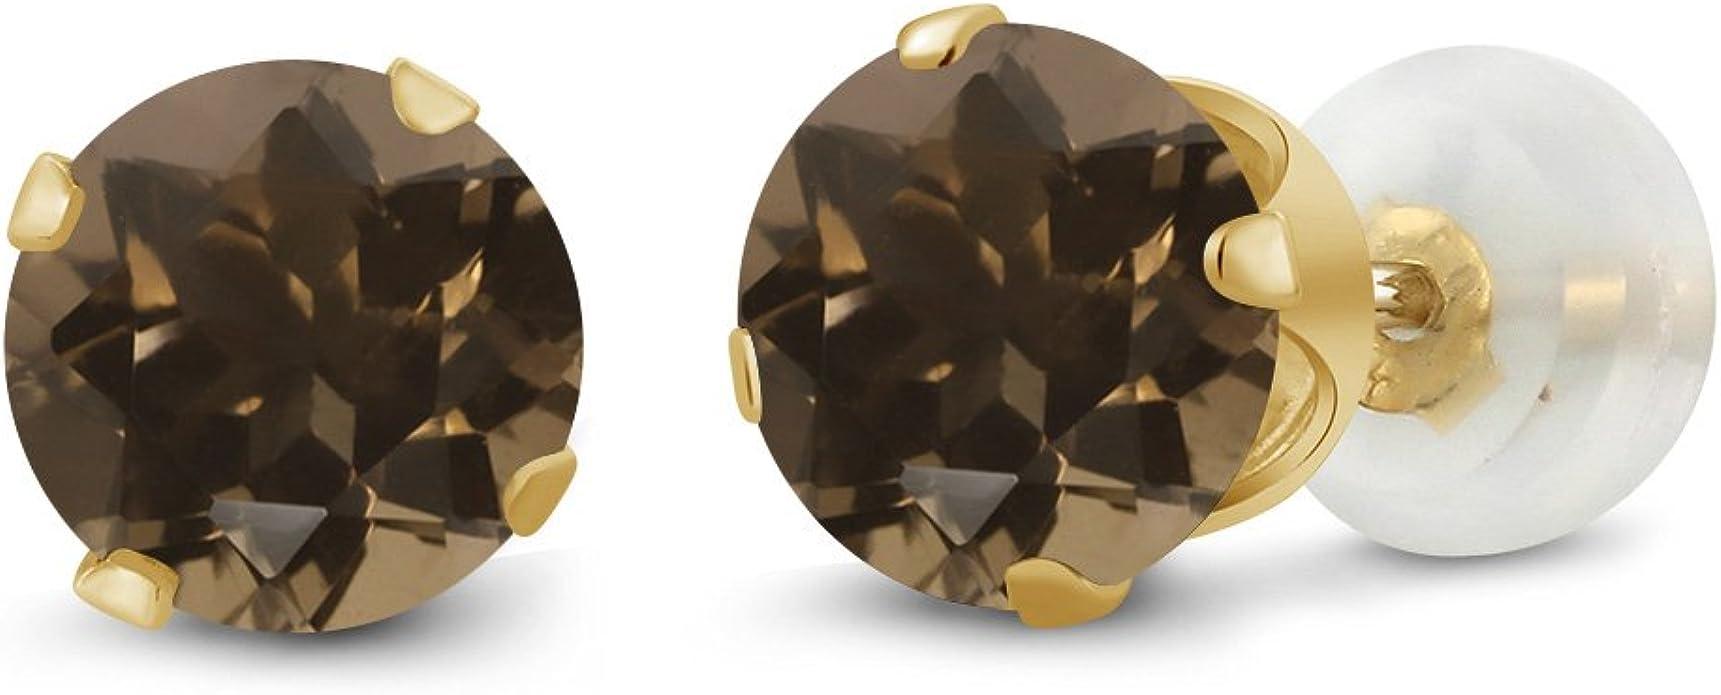 Natural Gemstones Earring Smoky Quartz Earrings 14k Gold Stud Earrings Smoky Quartz Earrings with Gold Setting Brown Stones Earrings